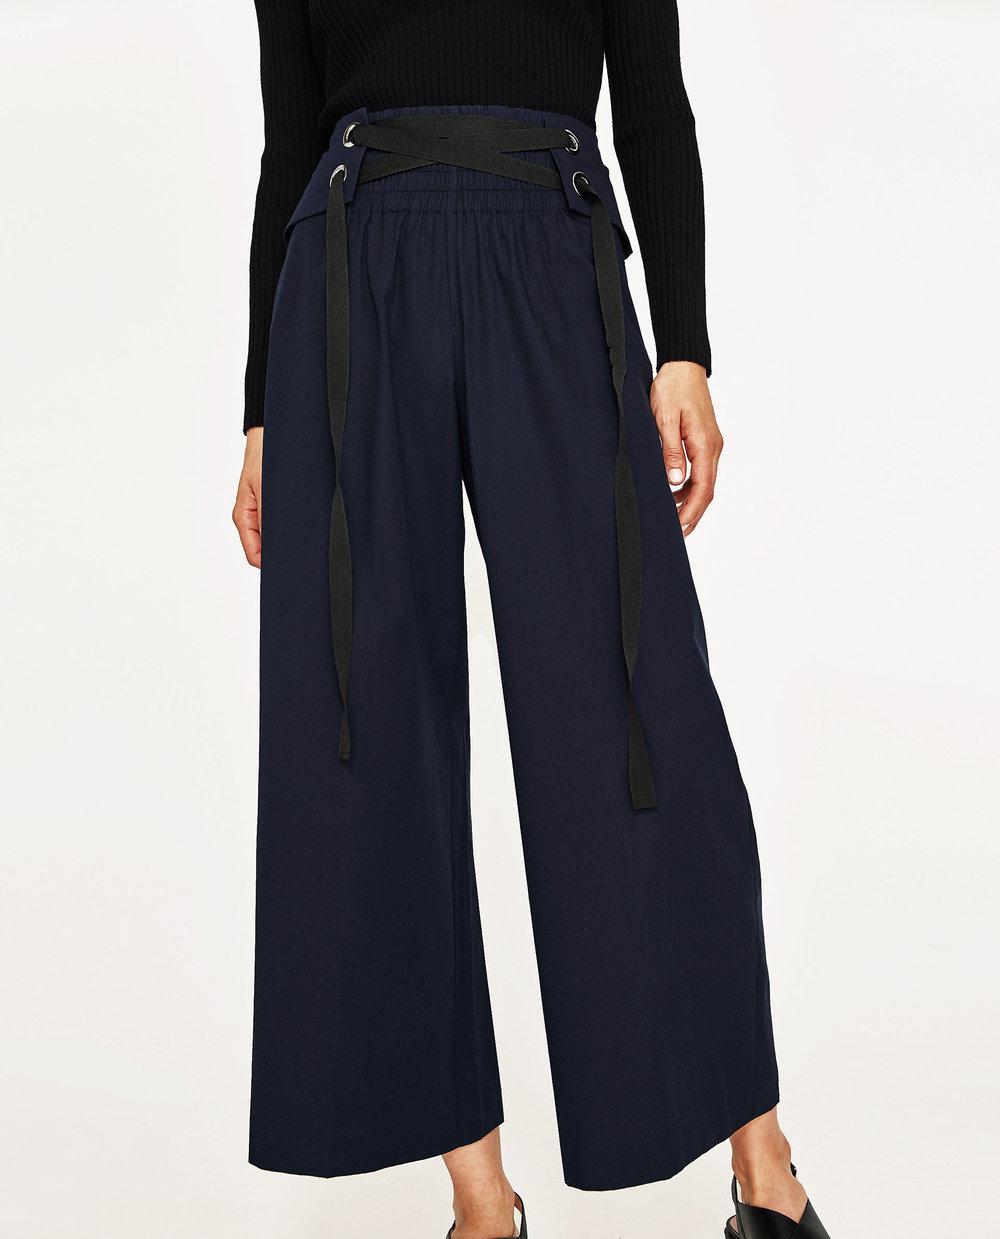 $49.90 - Zara Cropped Corset Belt Trousers